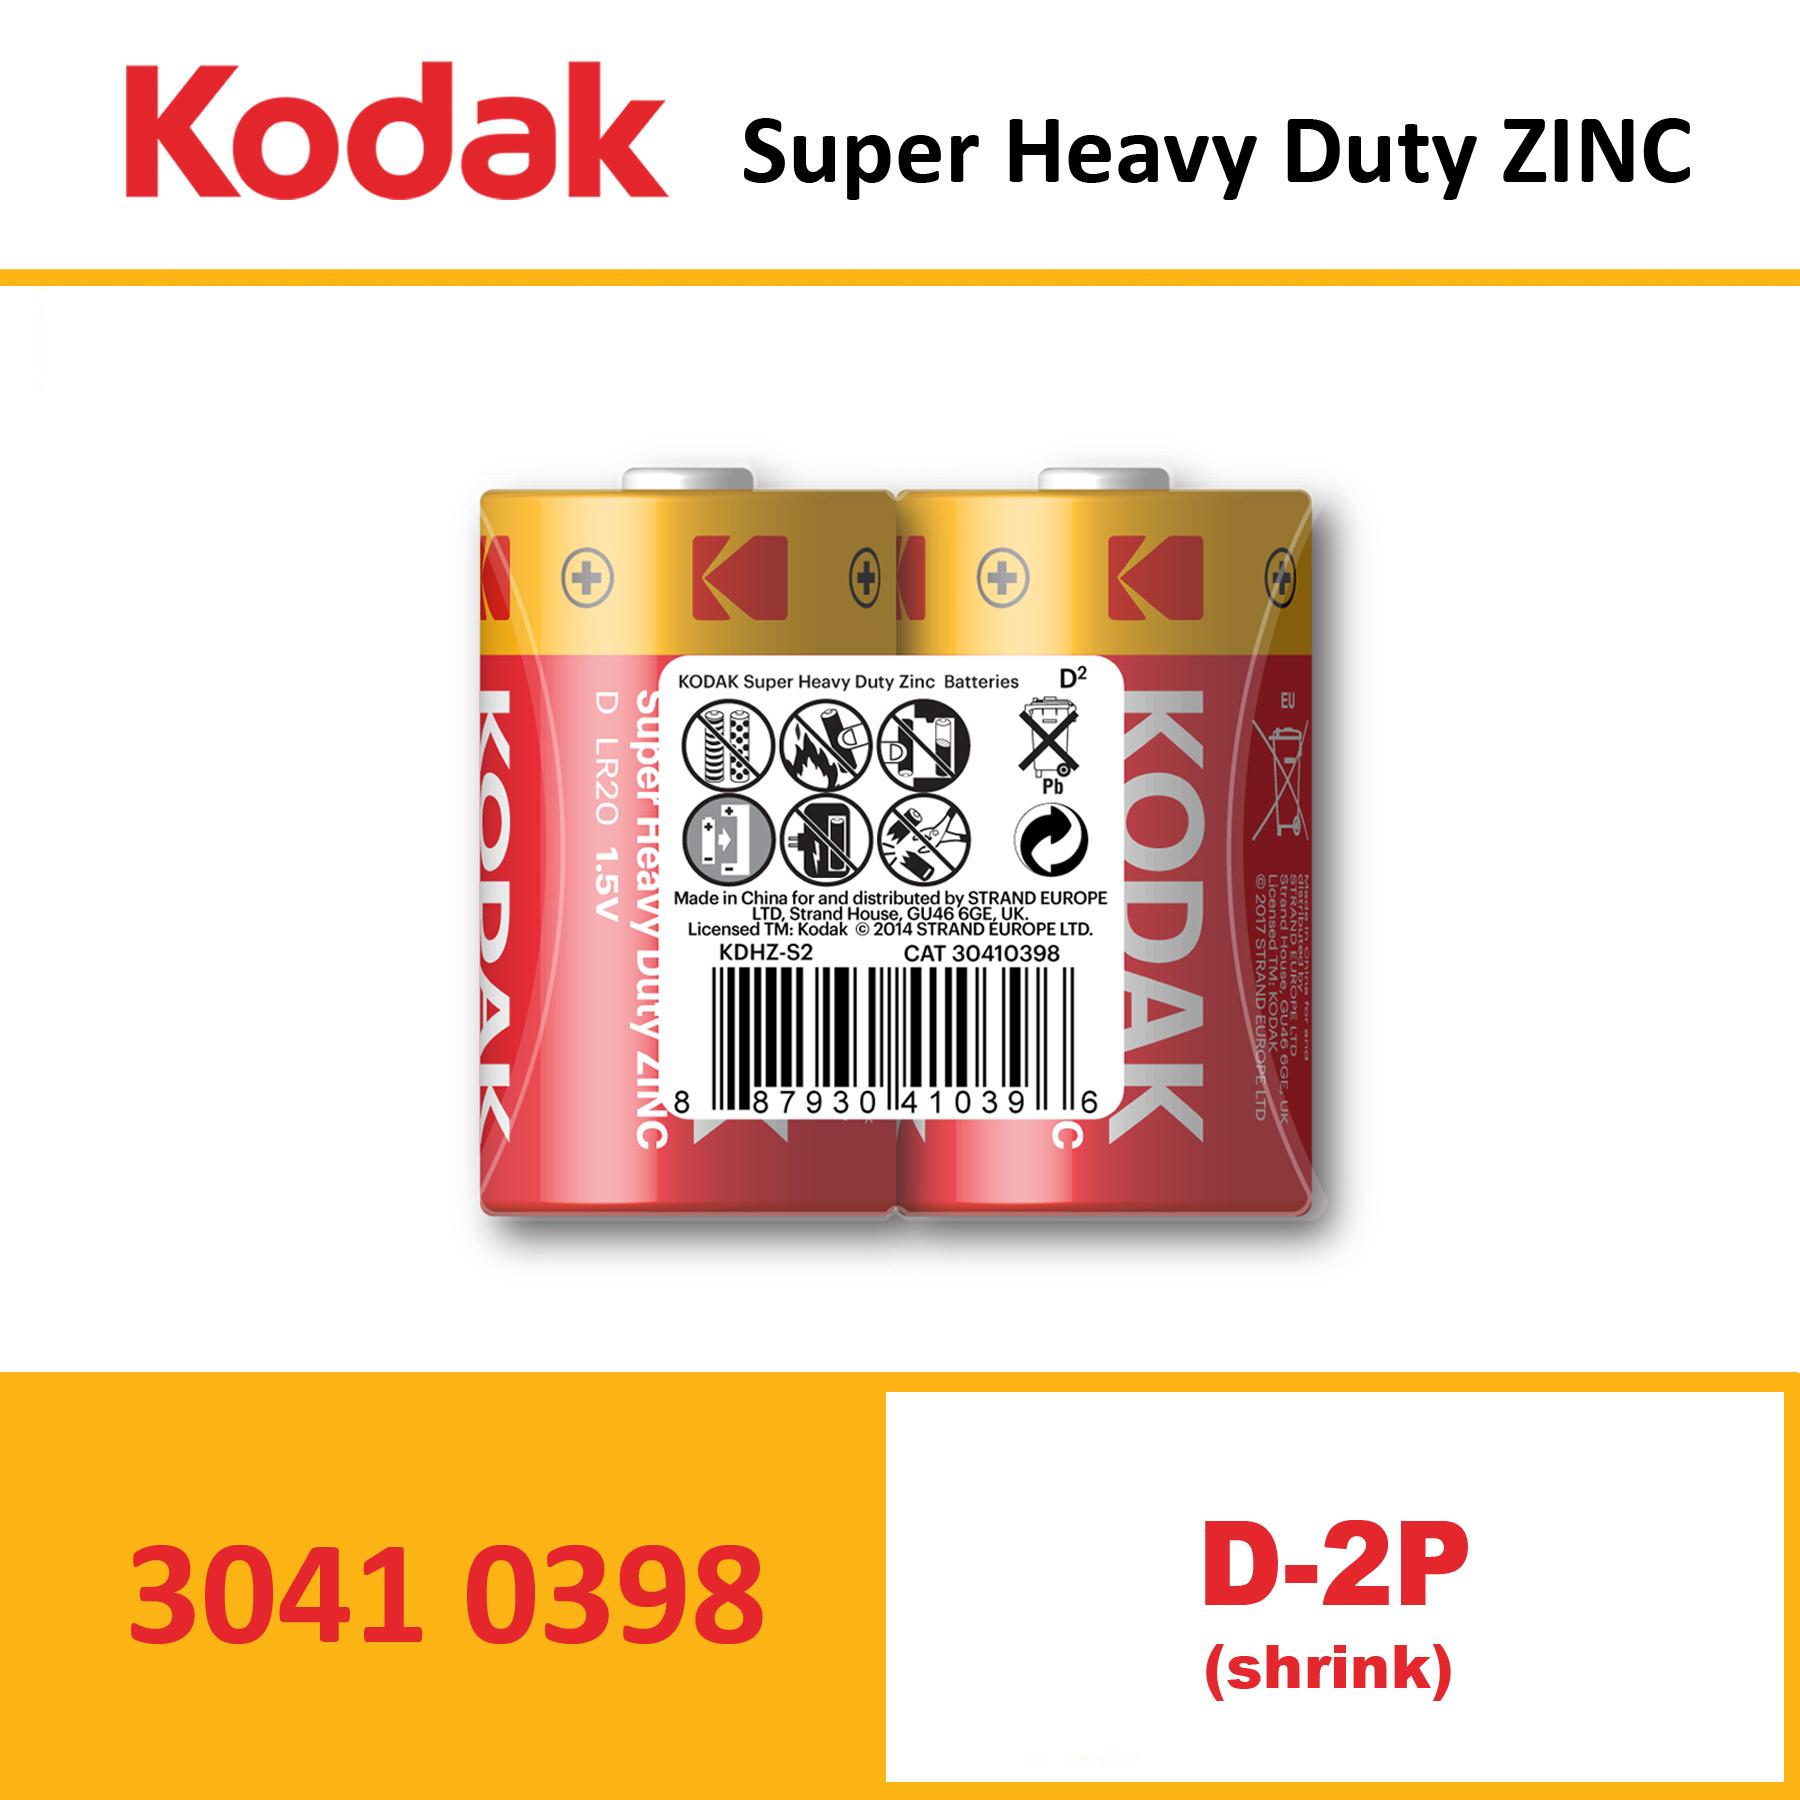 KODAK Super Heavy Duty Zinc Battery KDHZ SHRINK